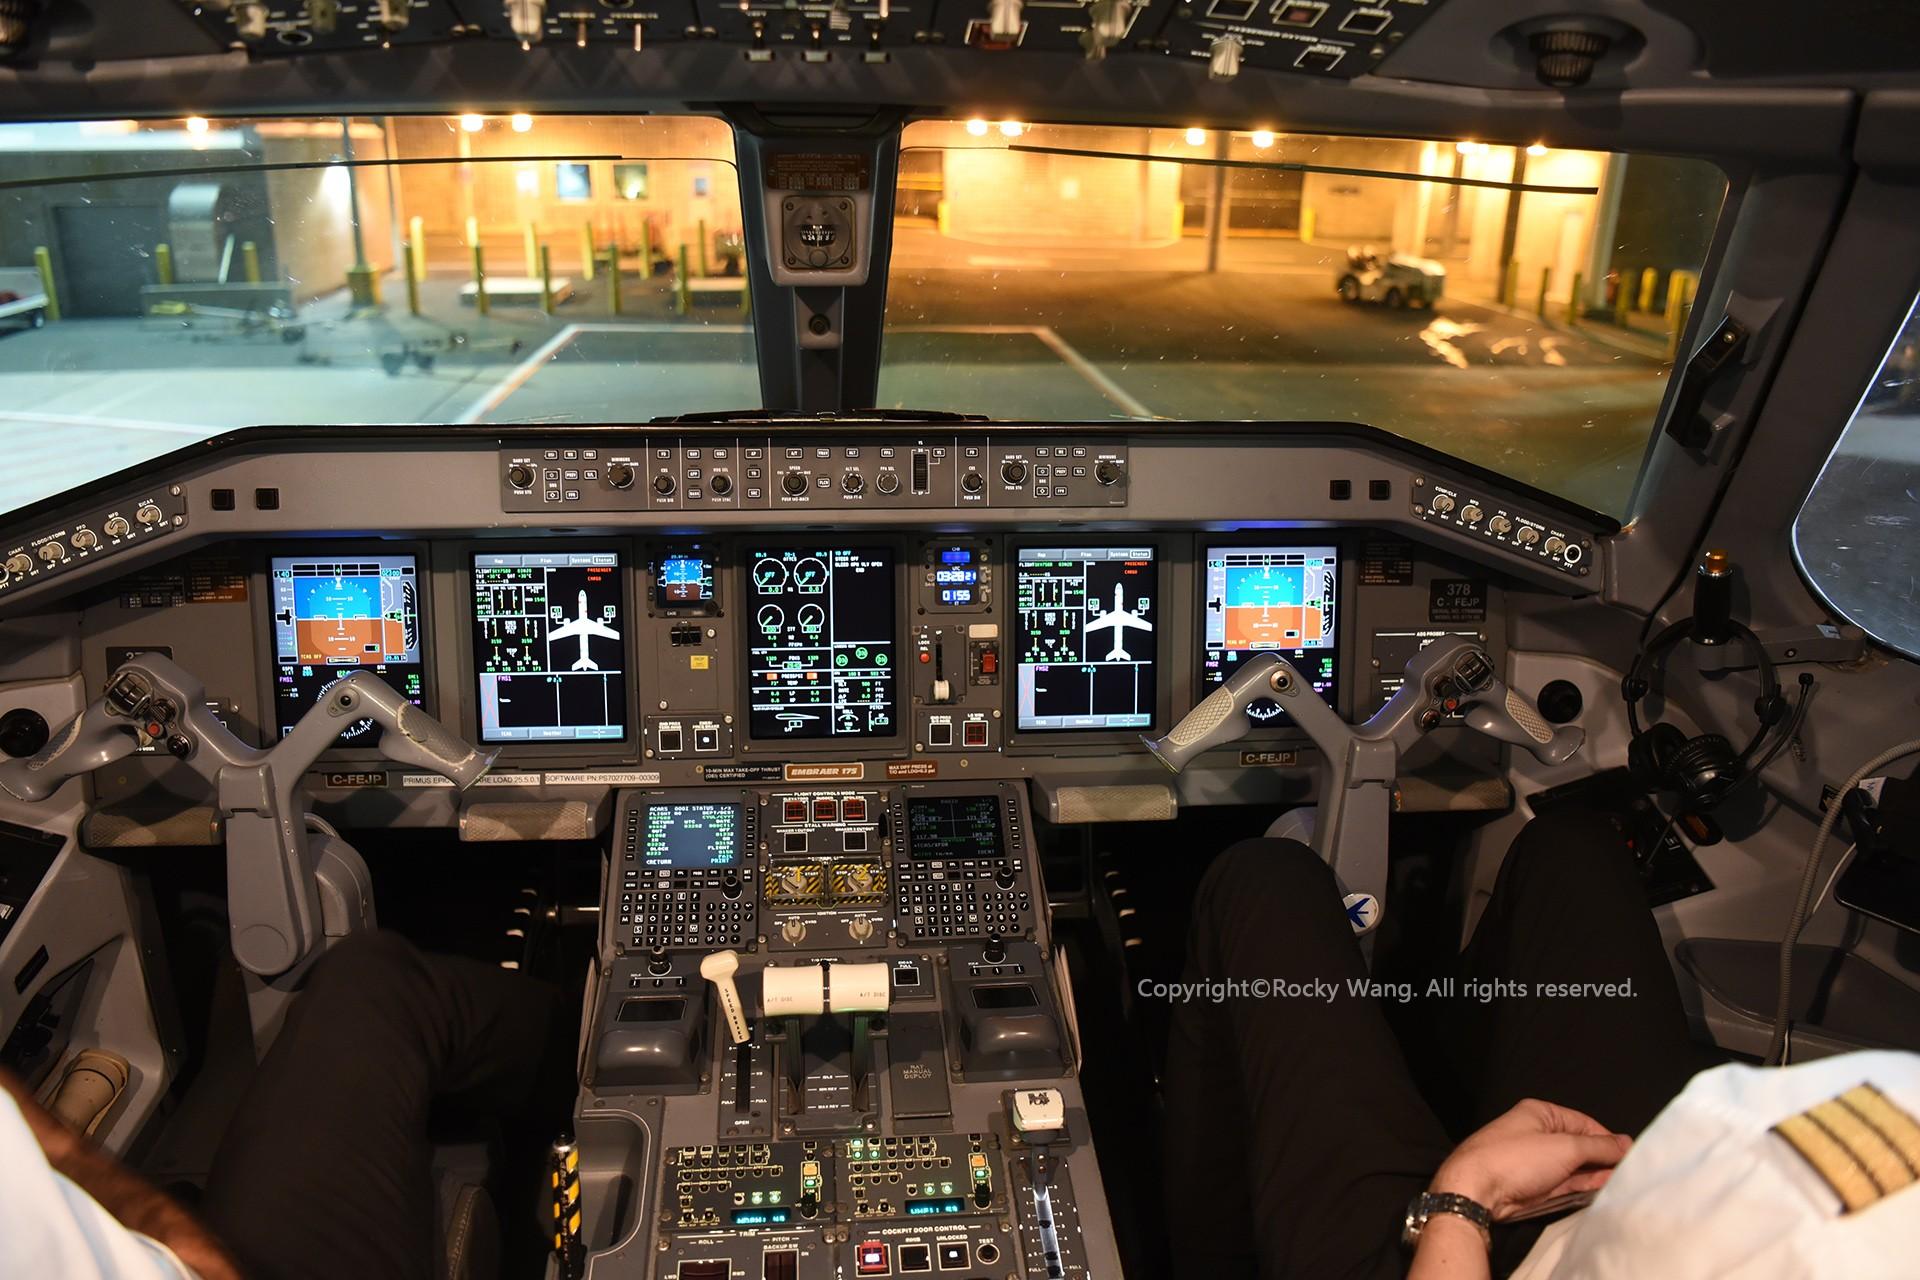 Re:[原创]简易版游记,纪念一次30段的环球飞行和一些碎碎念 EMBRAER 170-200SU C-FEJP St. John's Airport